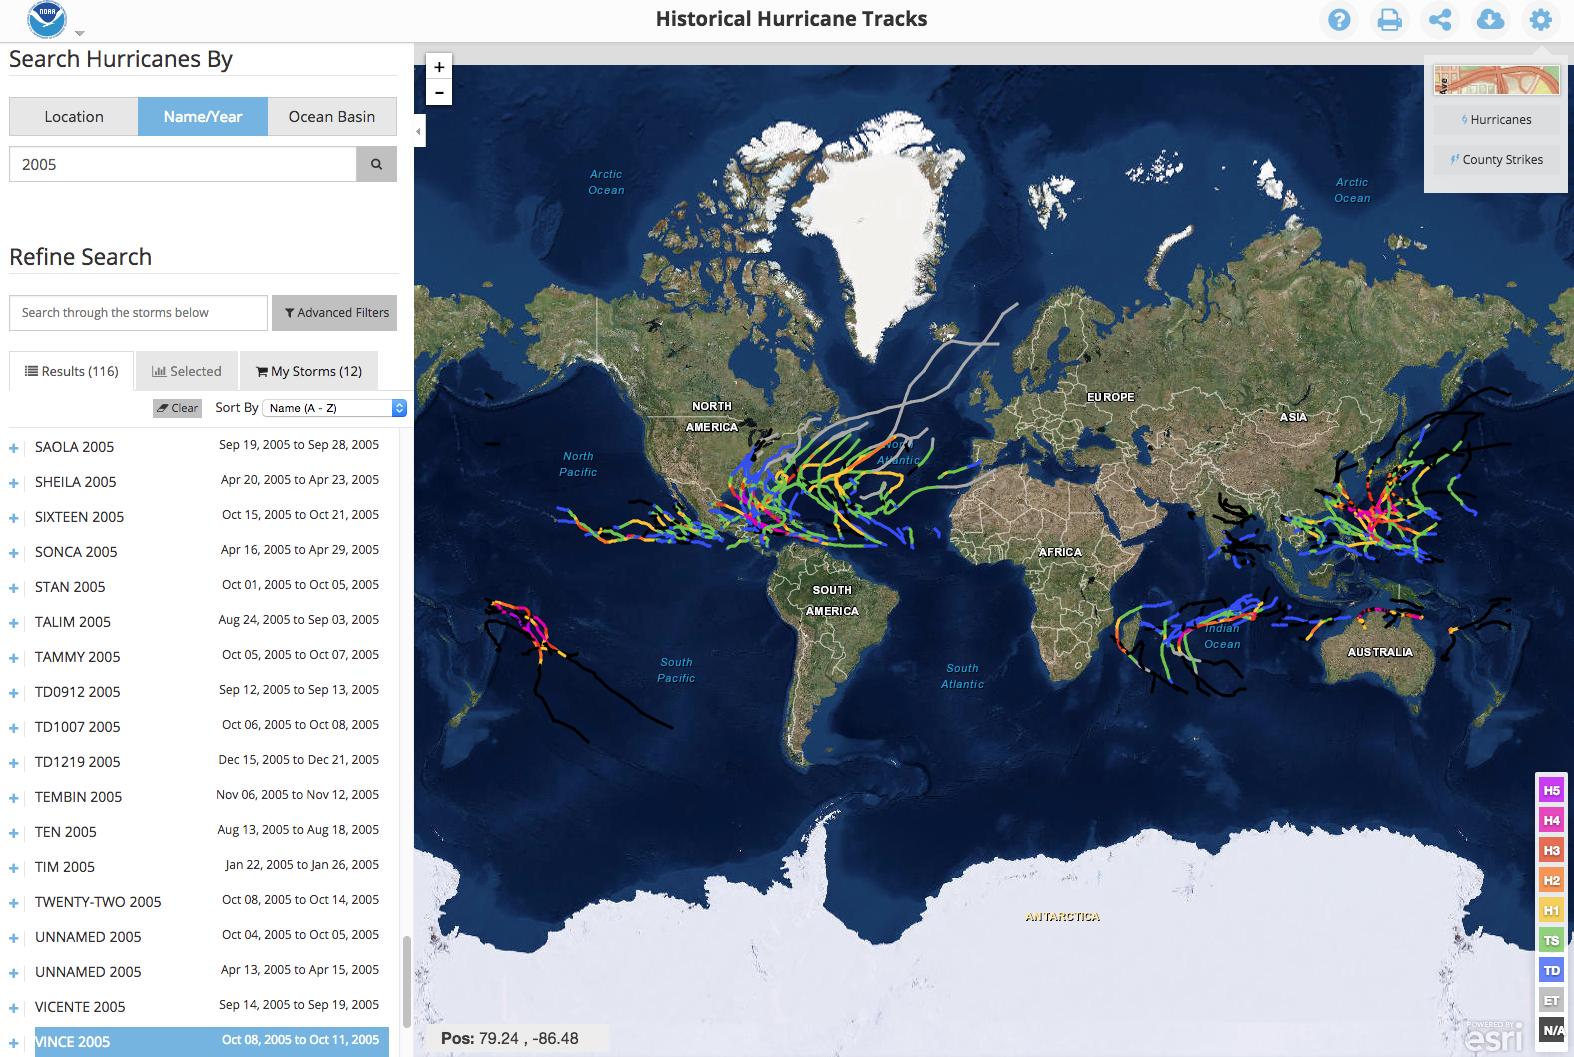 Plan interactif des ouragans mondiaux du NOAA